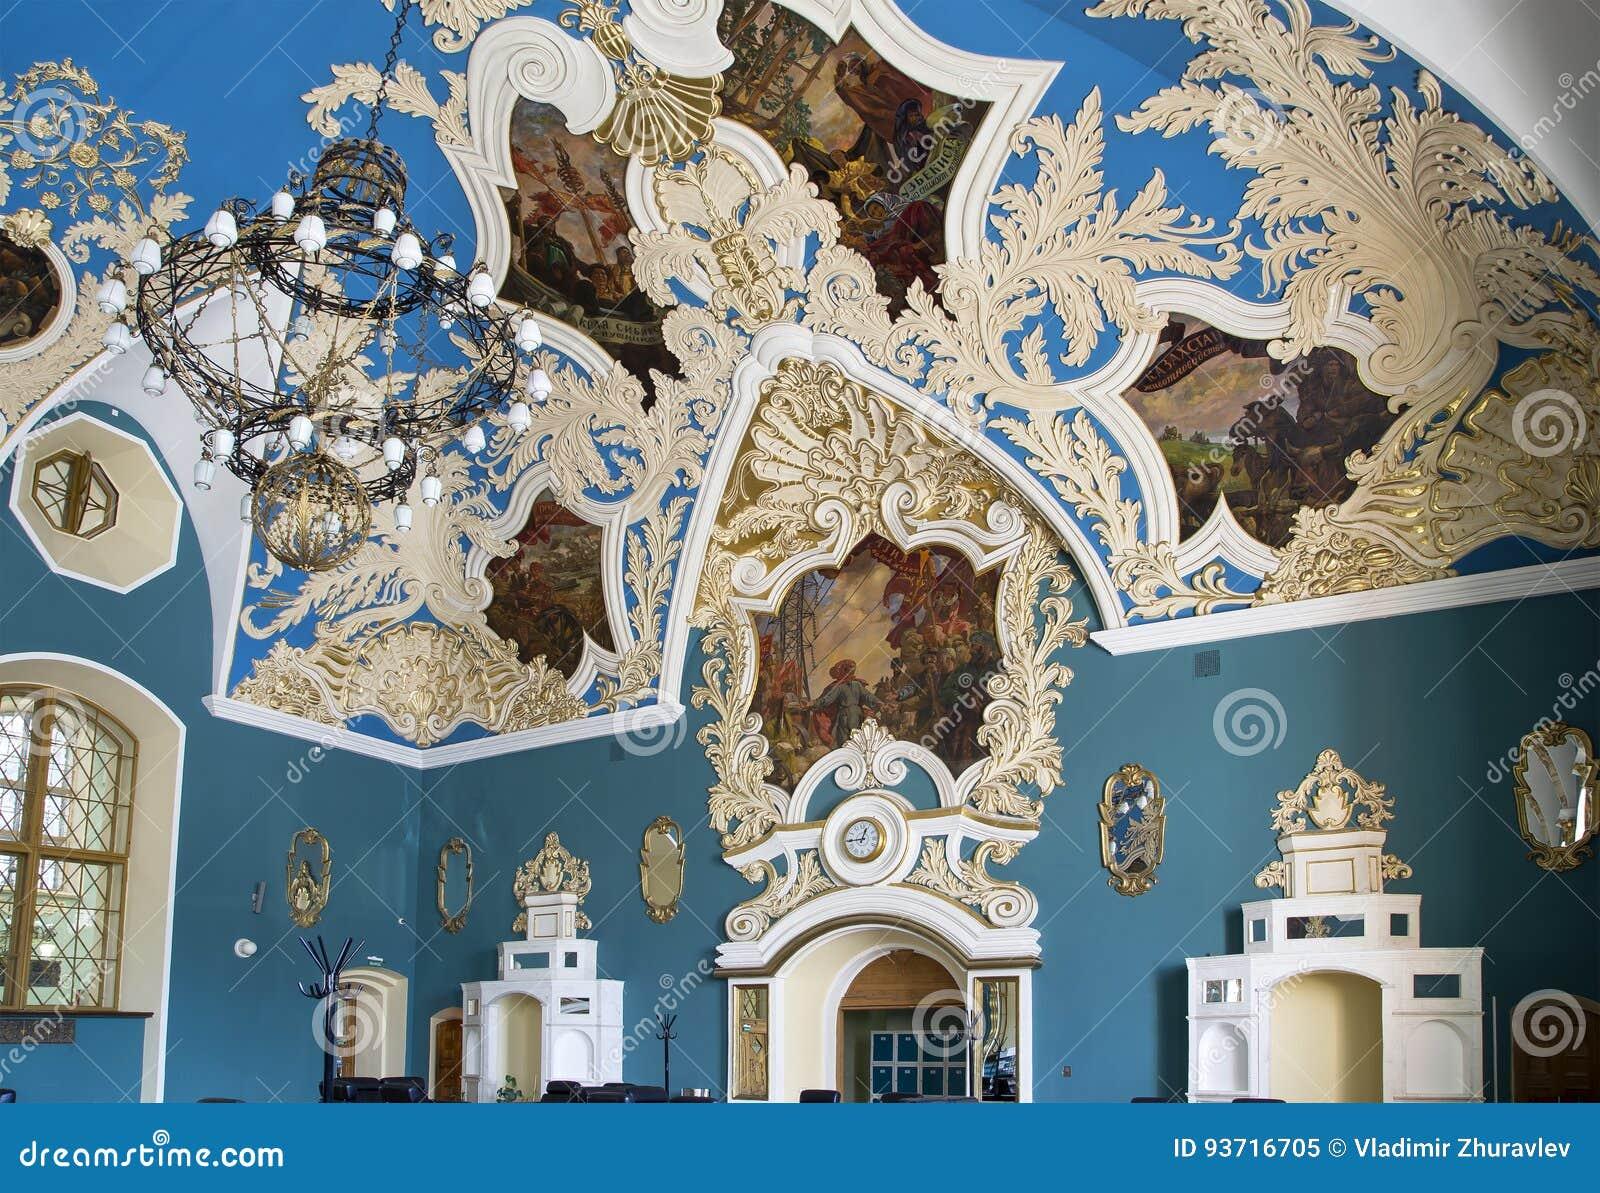 VIP-αίθουσα ή ένας υψηλότερος σταθμός Kazansky Kazansky άνεσης δωματίων σιδηροδρομικός vokzal -- είναι ένα από εννέα τερματικά σι